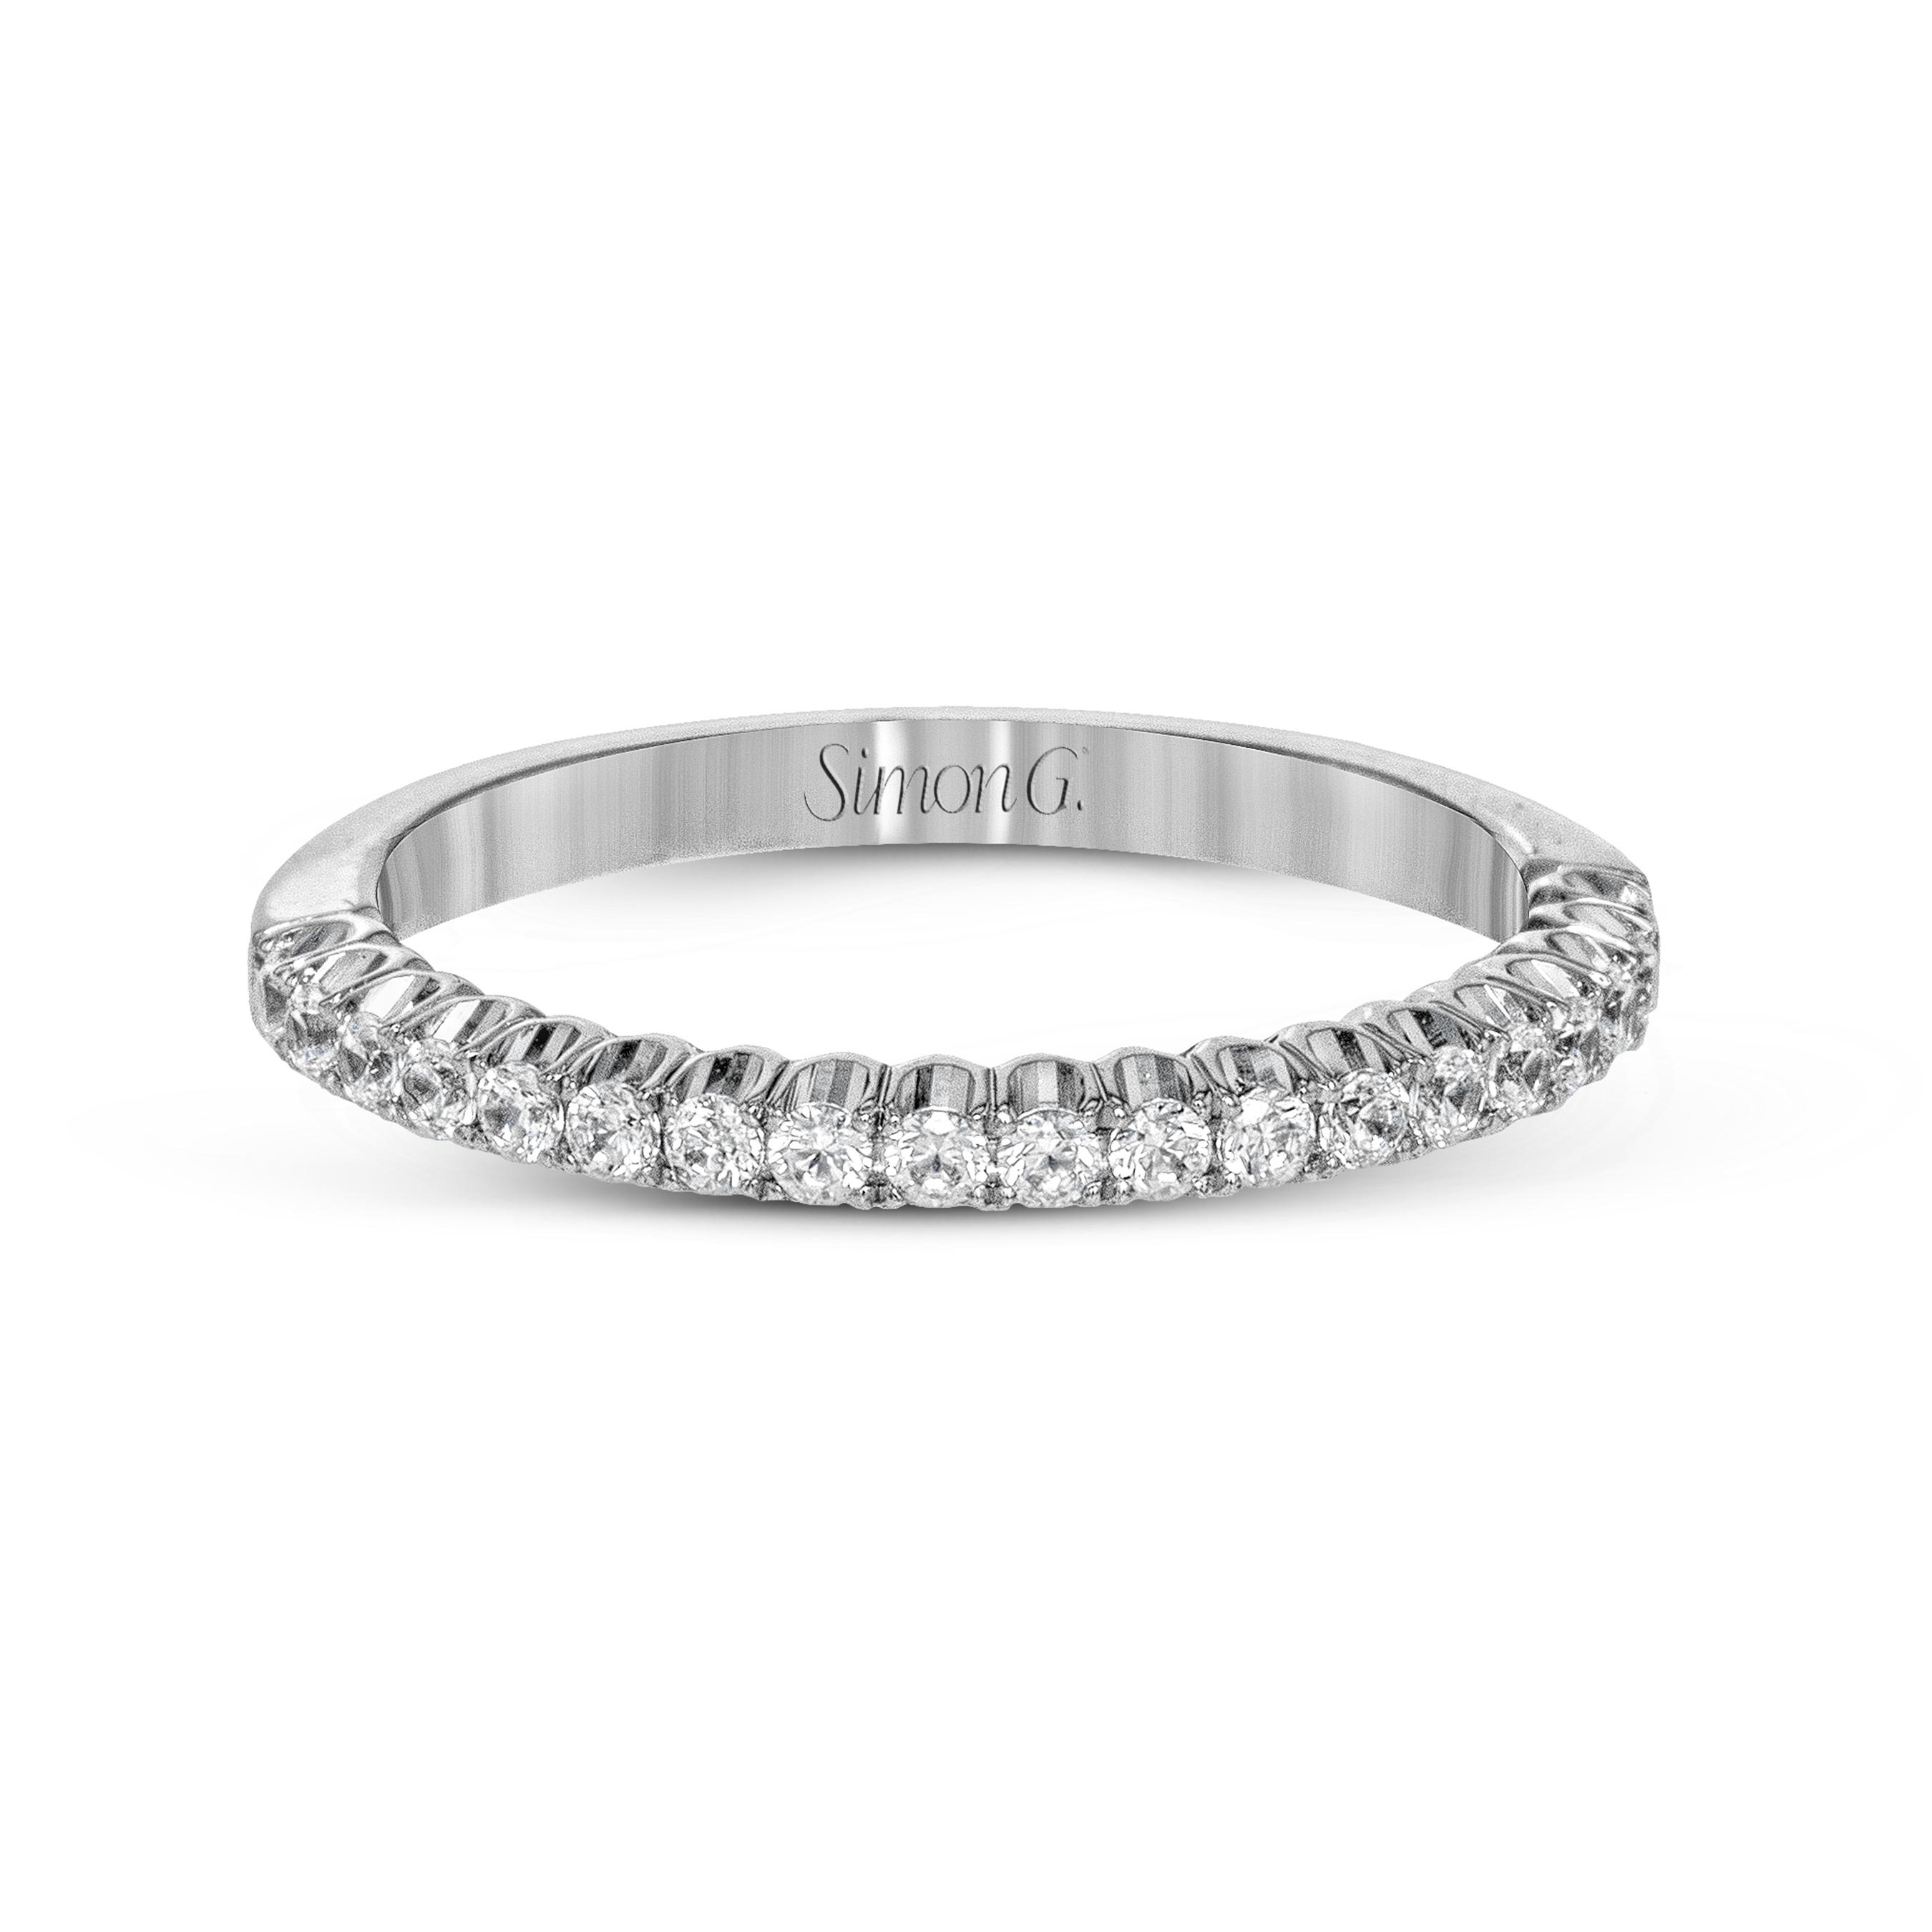 Simon G Lp2345 Passion Collection Women S White Gold Wedding Ring